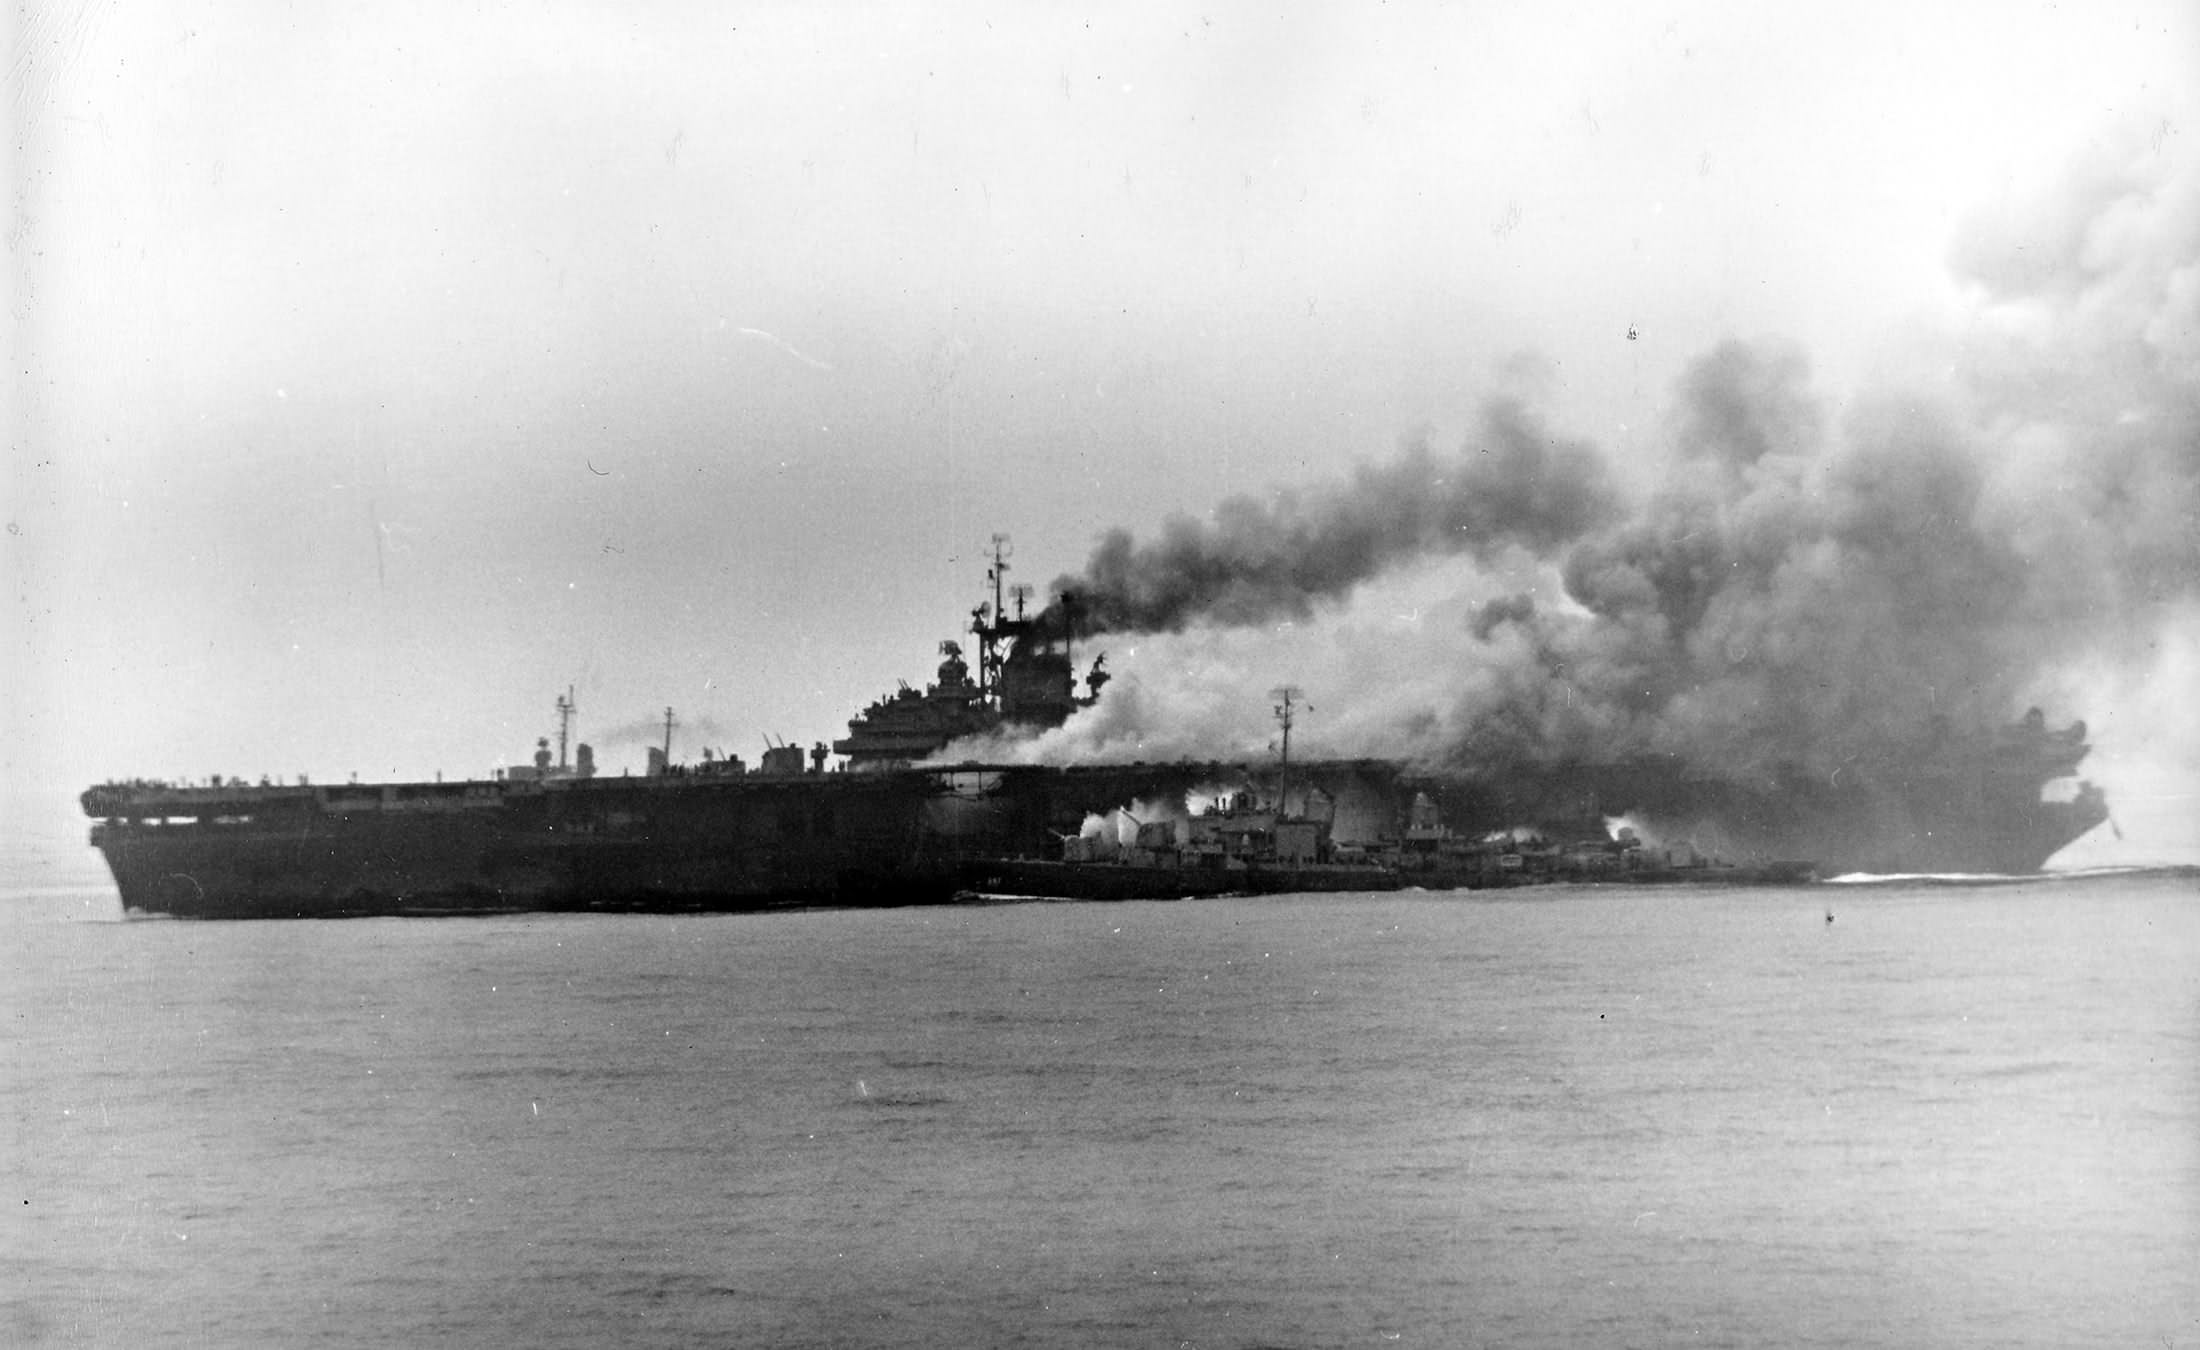 Burning USS Bunker Hill – 11 May 1945